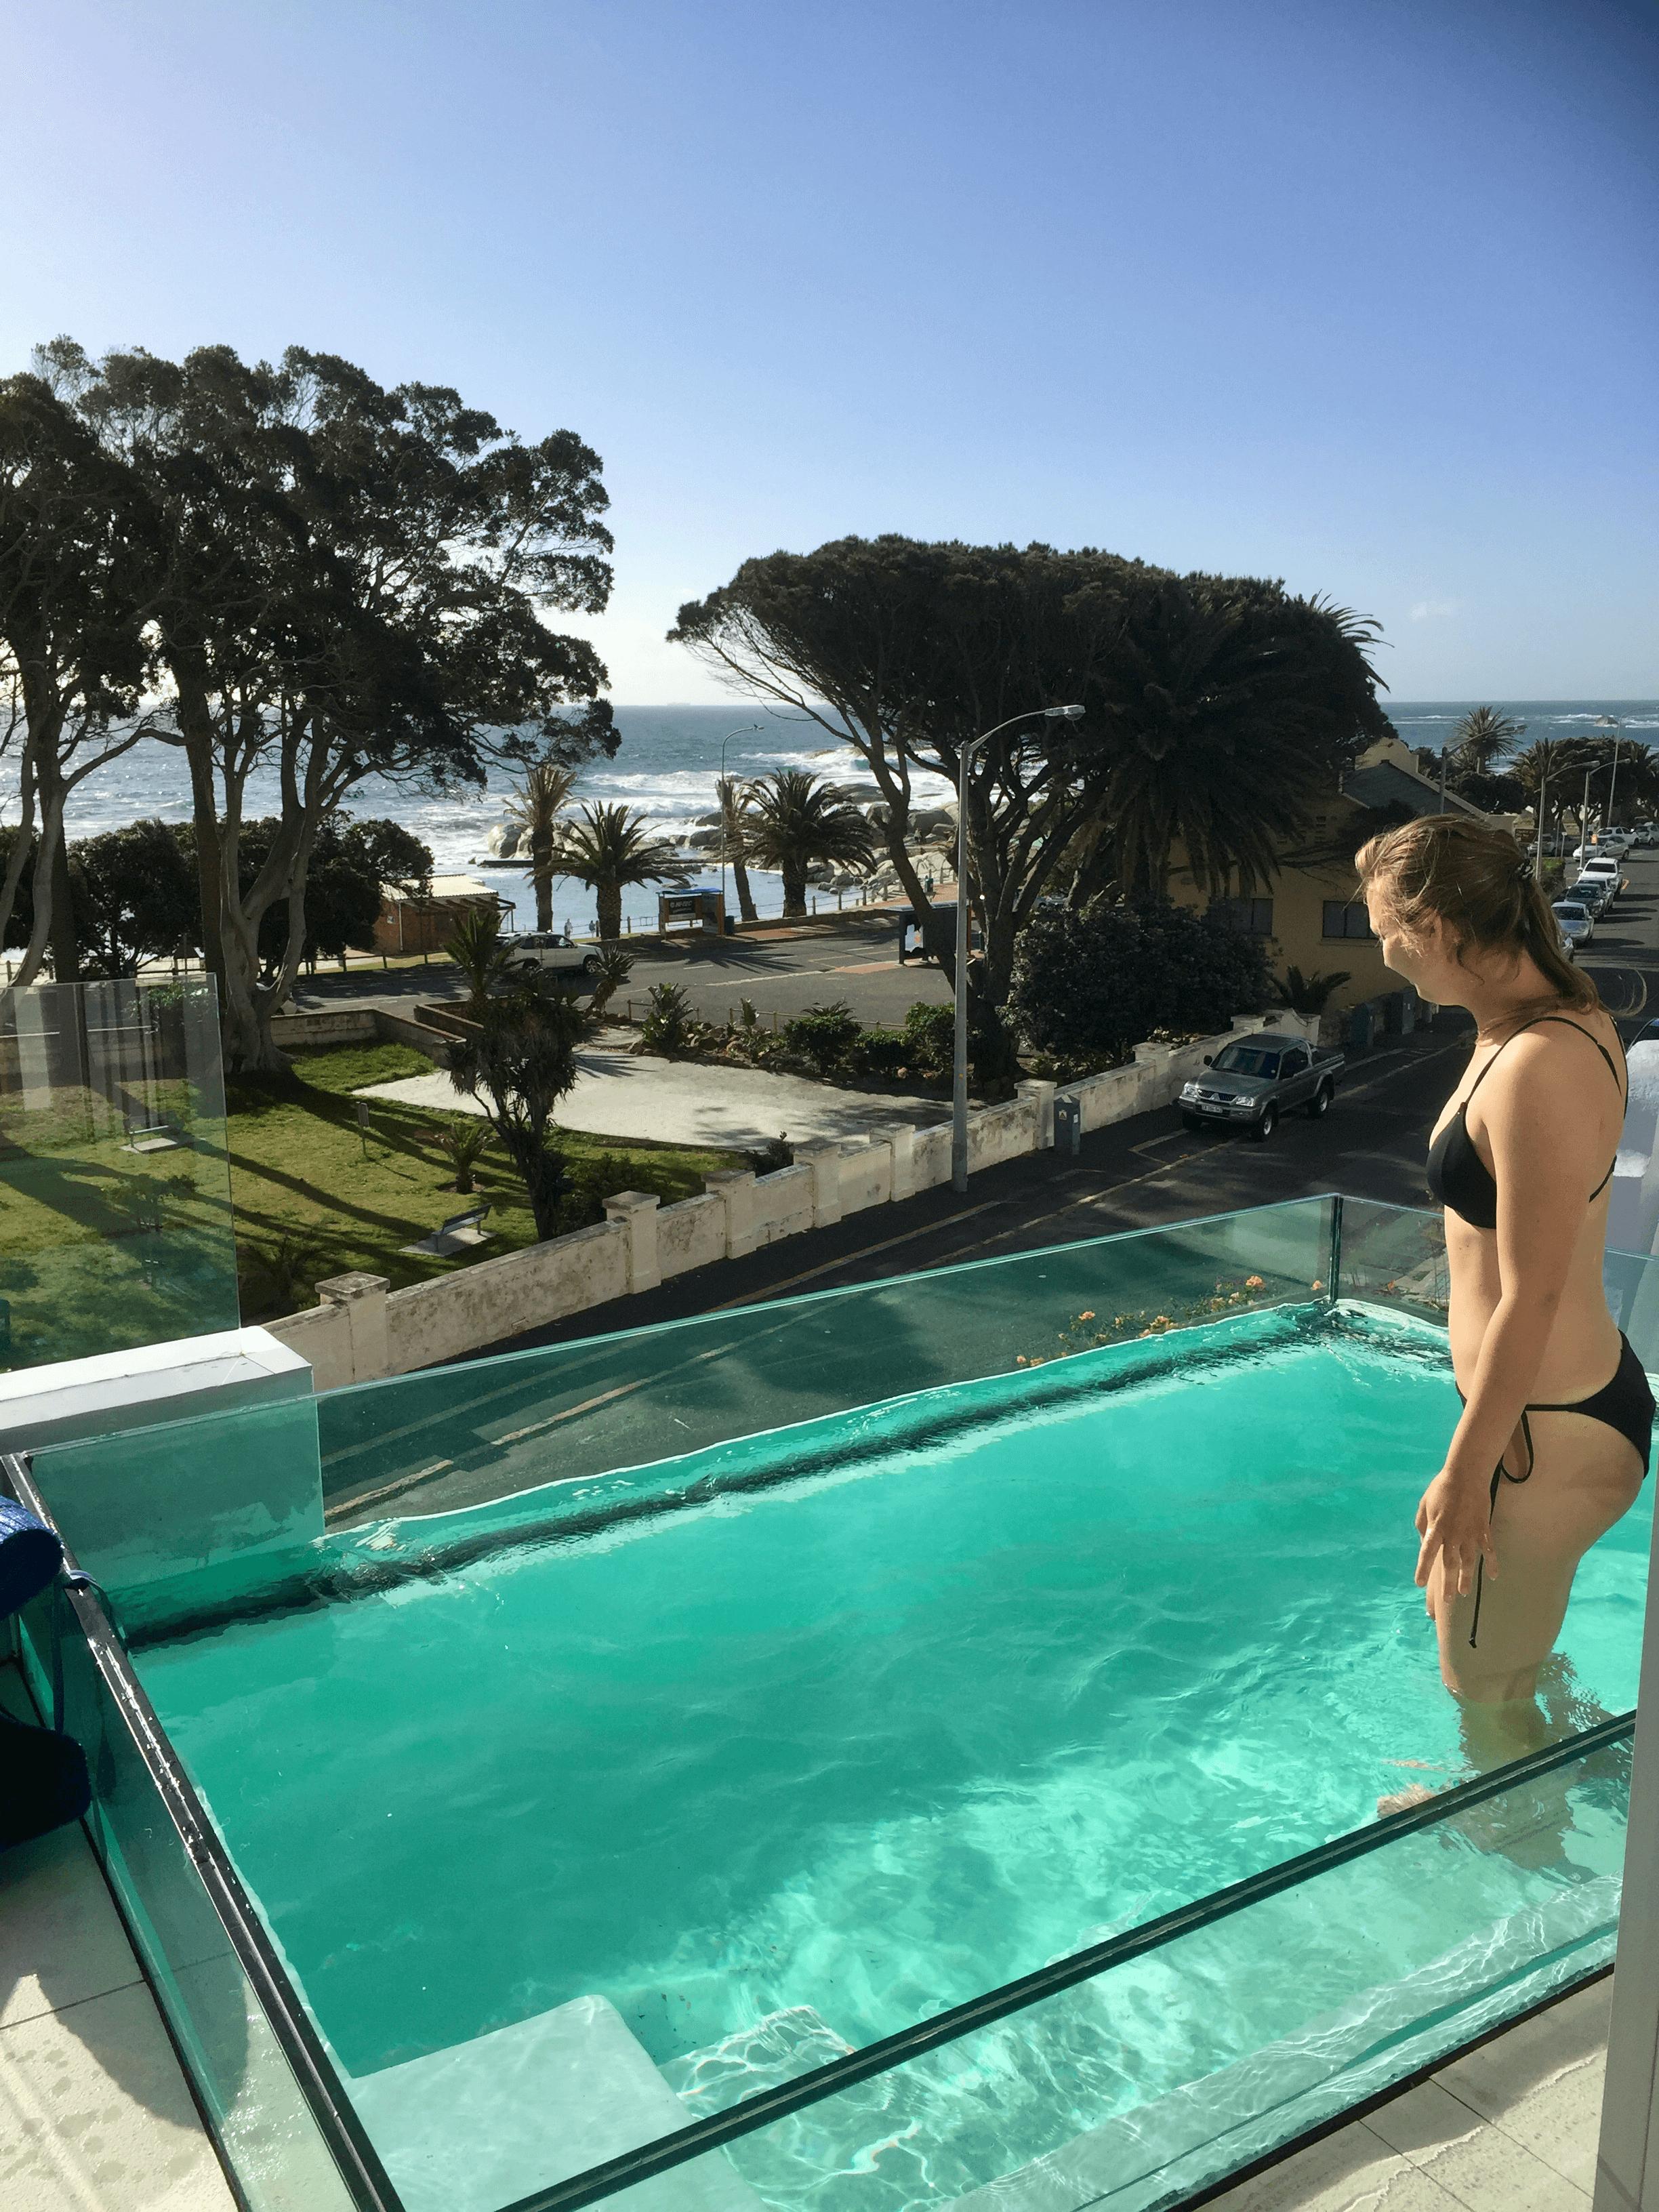 South Beach Camps Bay